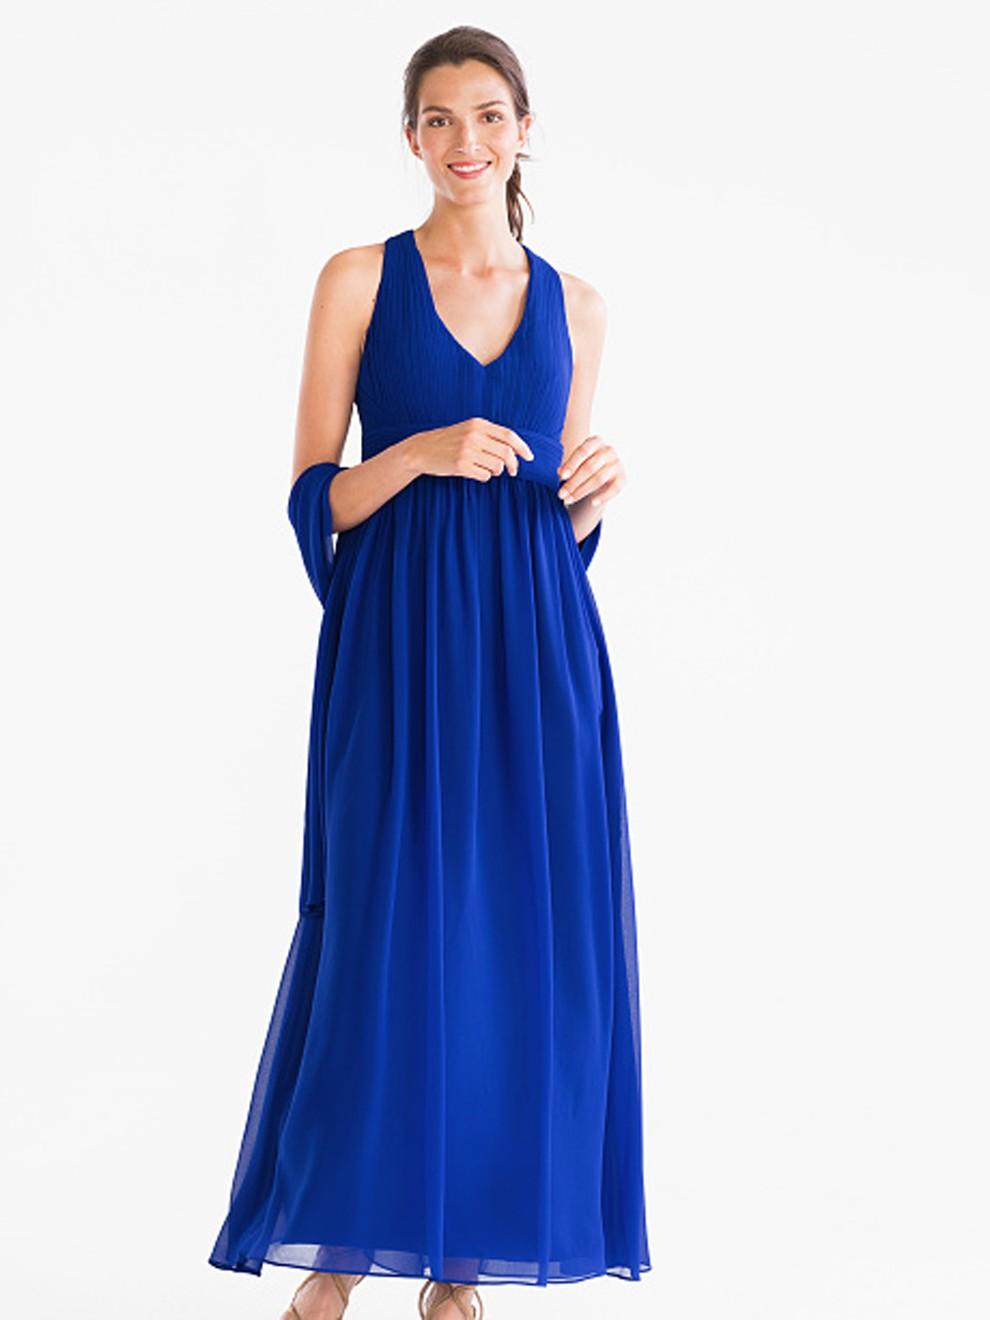 Vestido azul eléctrico de C&A por 99 euros